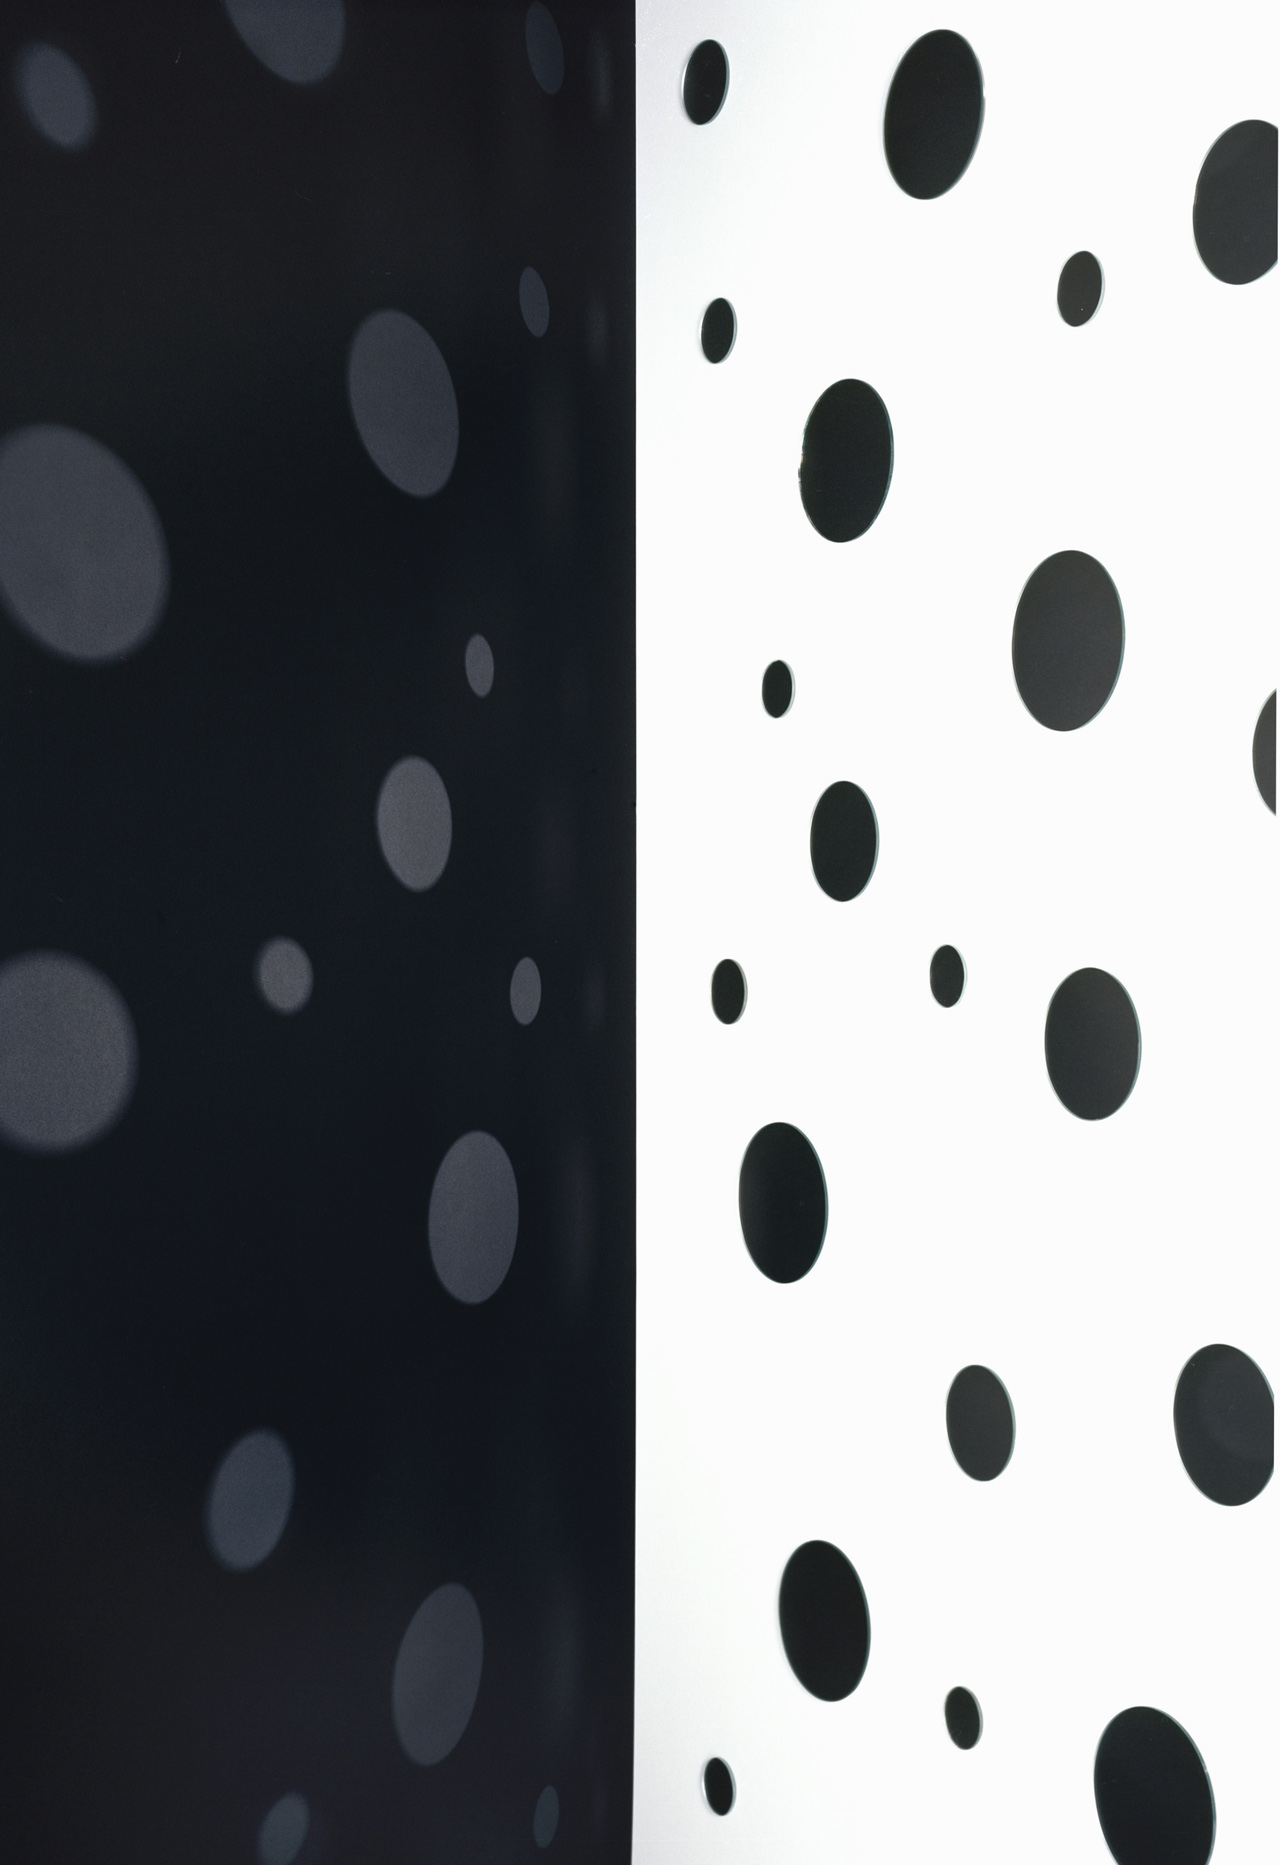 JACKY REDGATE   Light Throw (Mirrors) Fold - Black and White  2018 Chromogenic photograph handprinted 185 x 127 cm